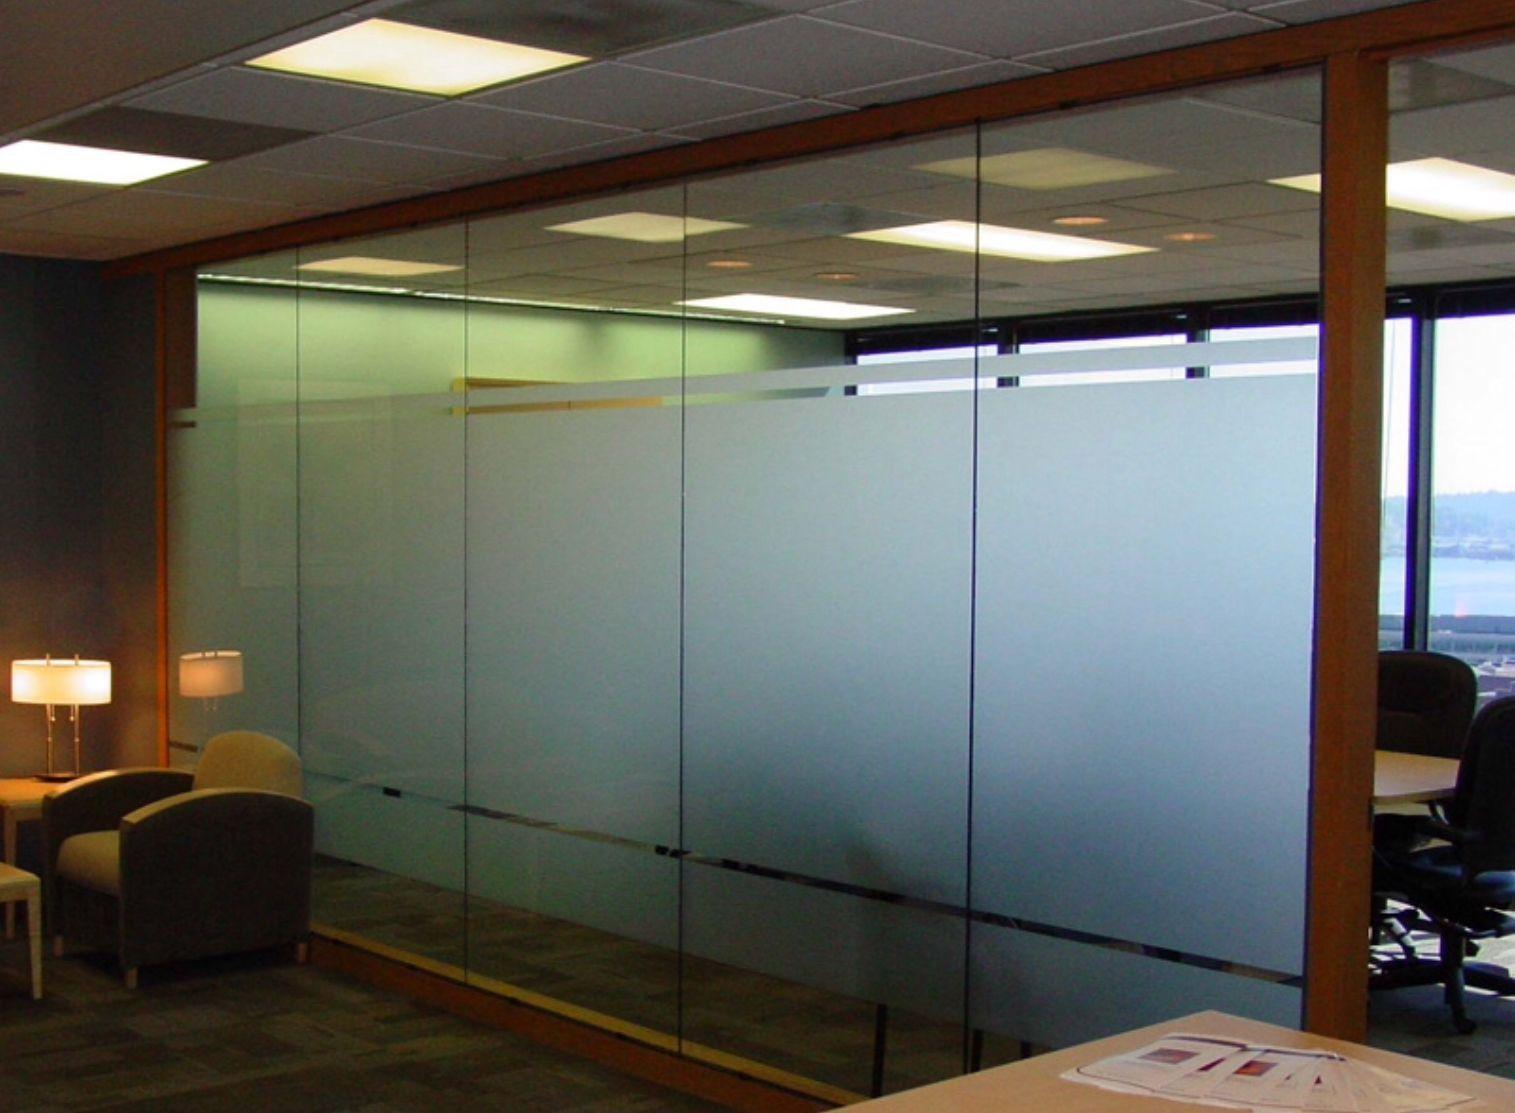 Sala De Juntas Glass Office Glass Conference Room Glass Film